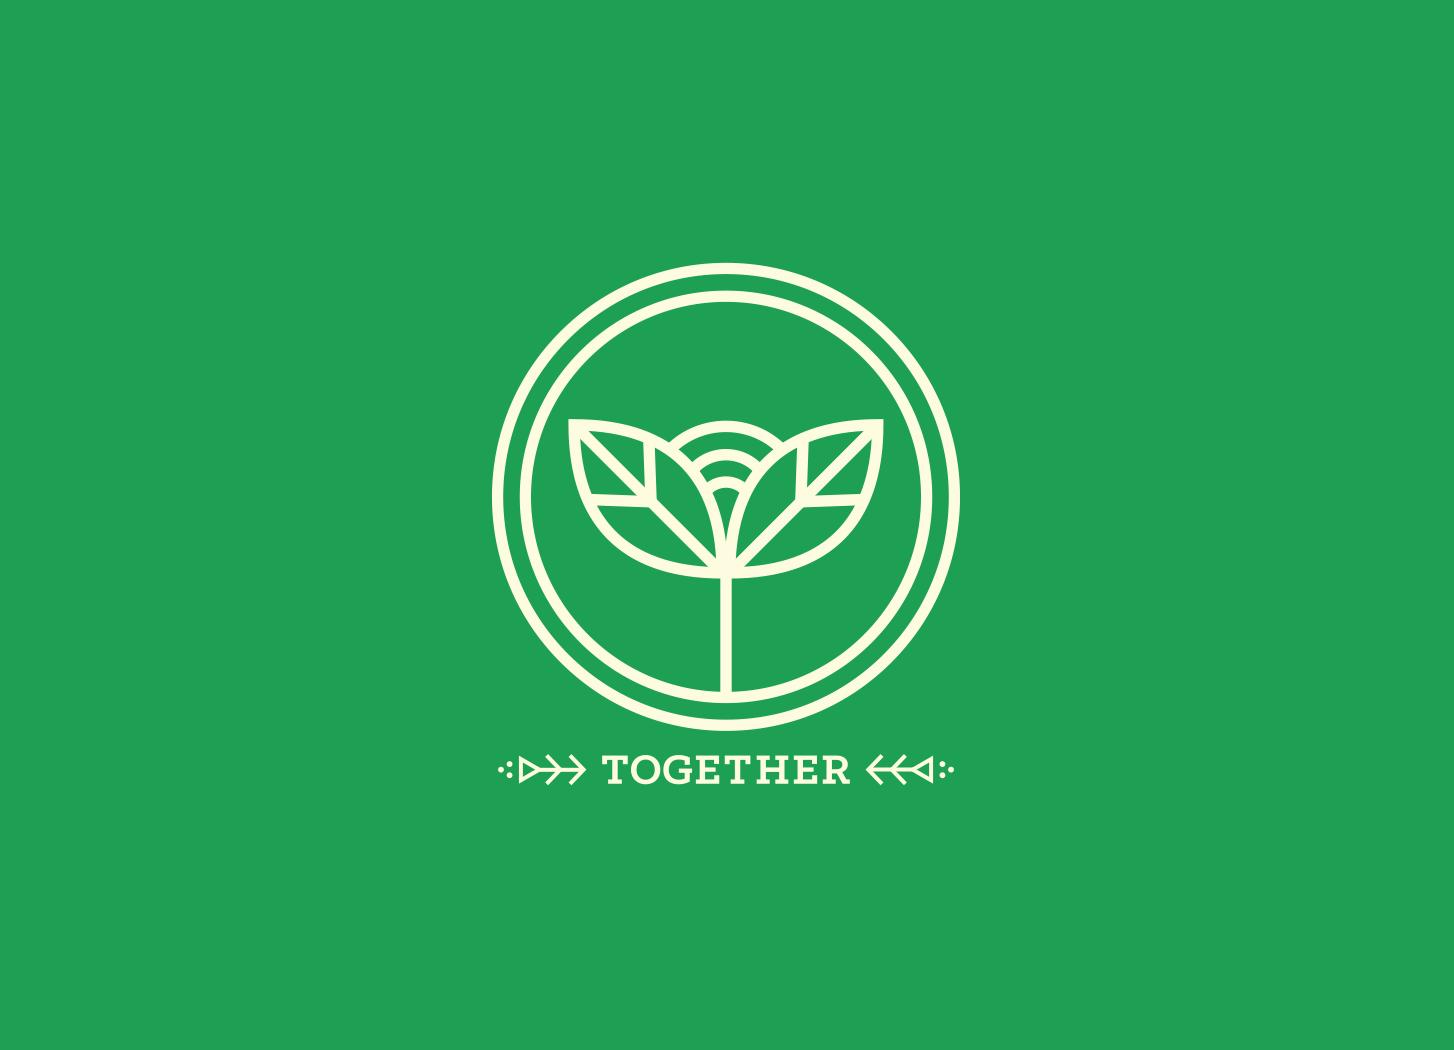 together01.png